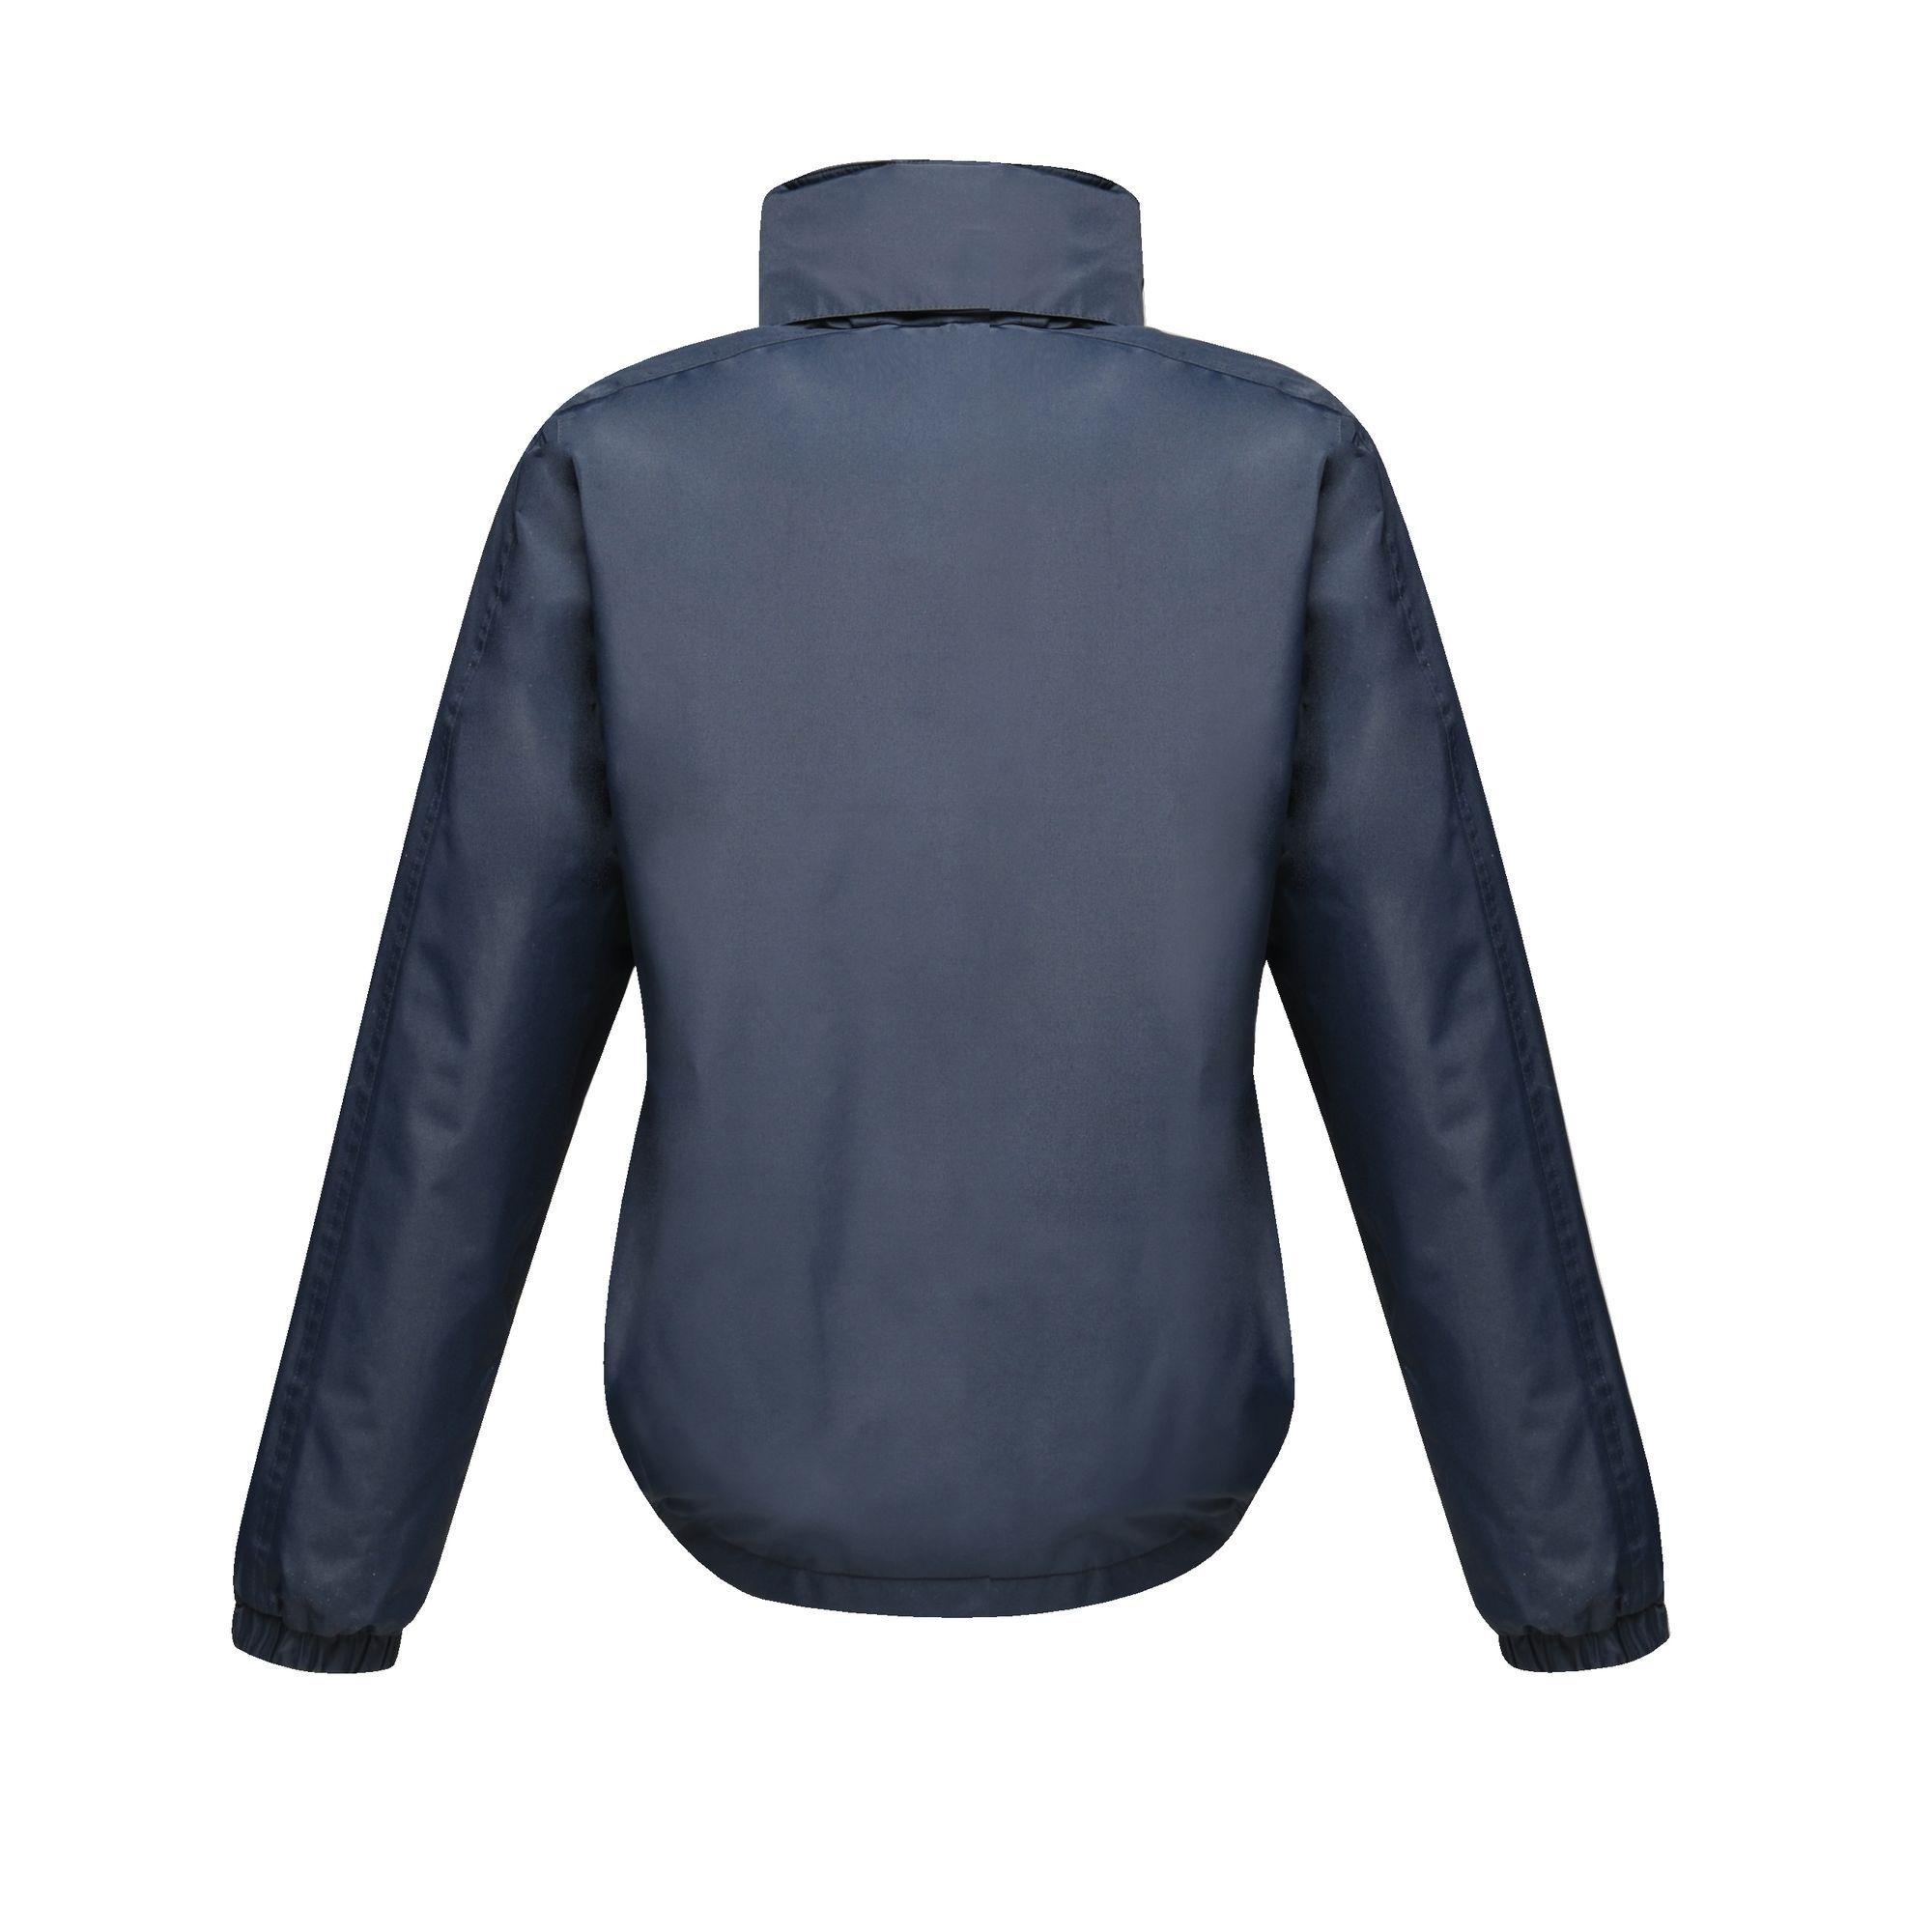 Regatta Womens/Ladies Dover Waterproof Insulated Jacket